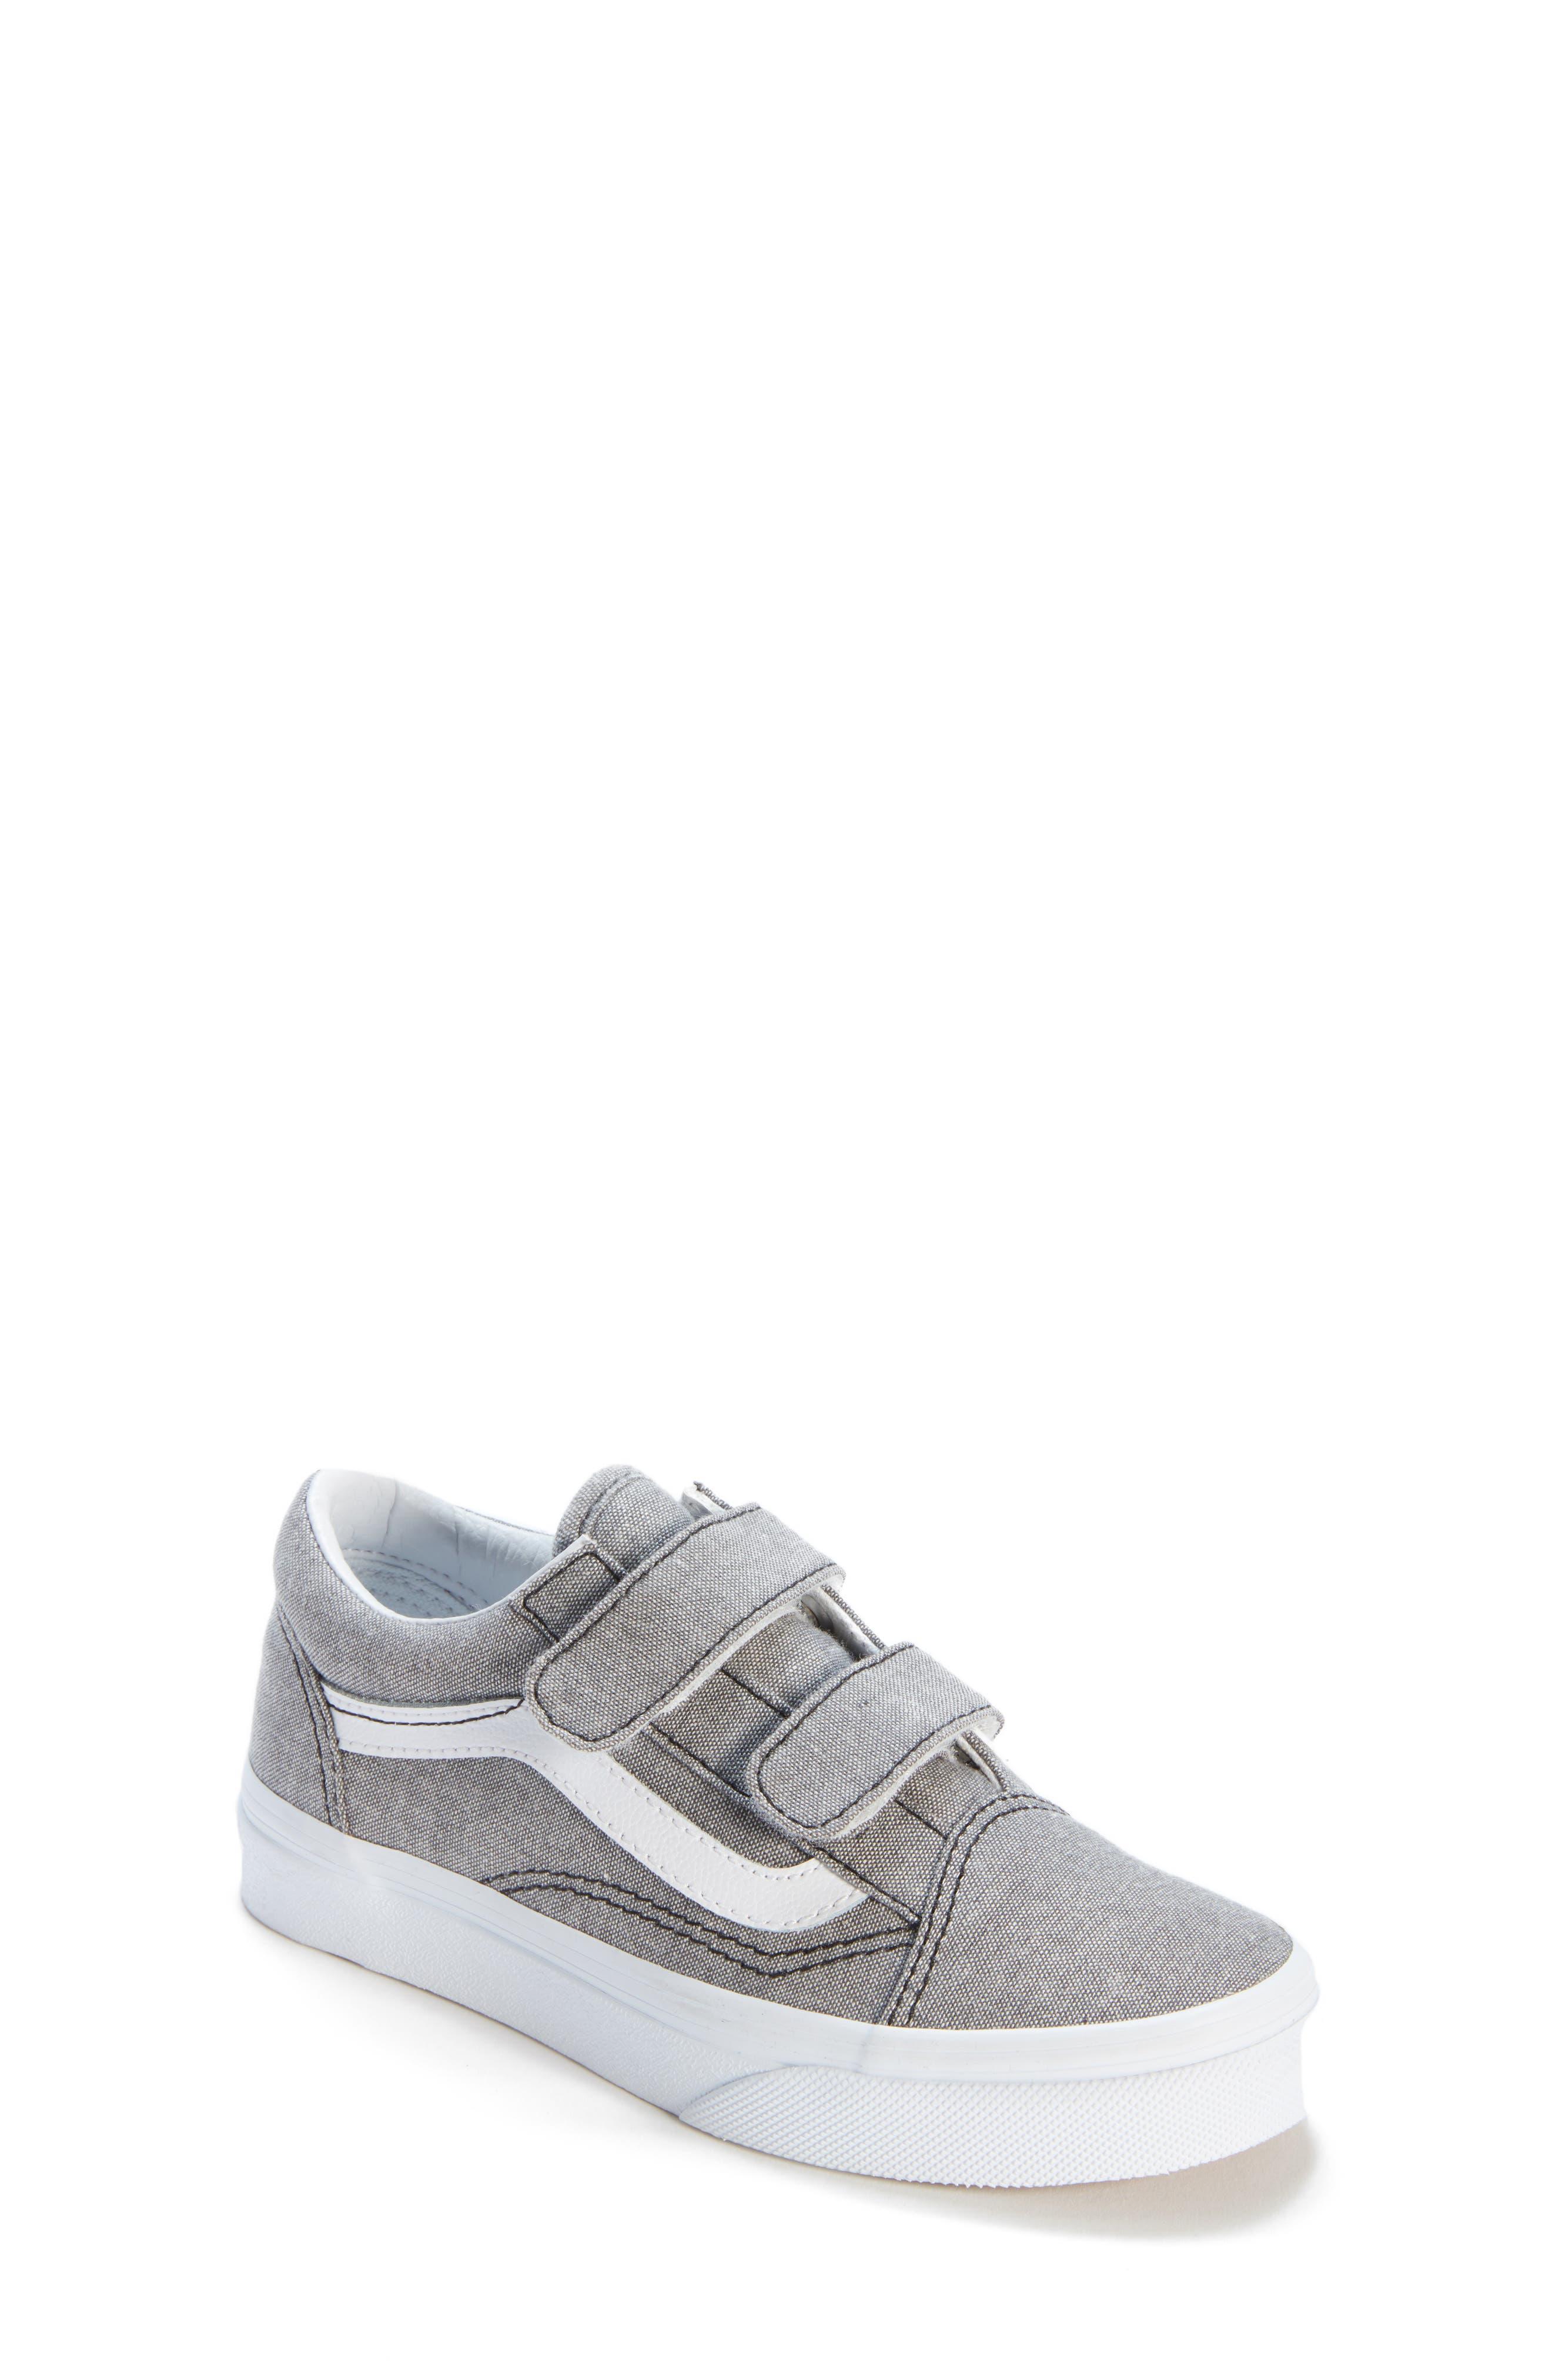 'Old Skool' Sneaker,                             Main thumbnail 1, color,                             OXFORD GRAY TRUE WHITE